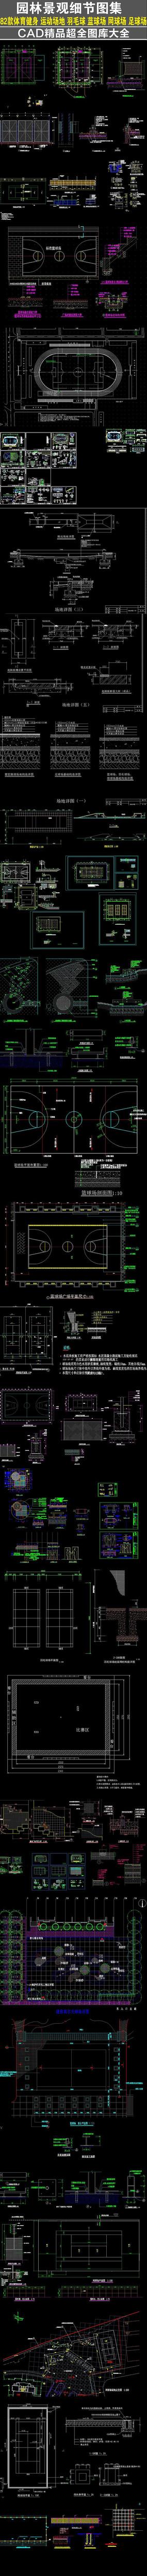 82款体育健身场地CAD图库